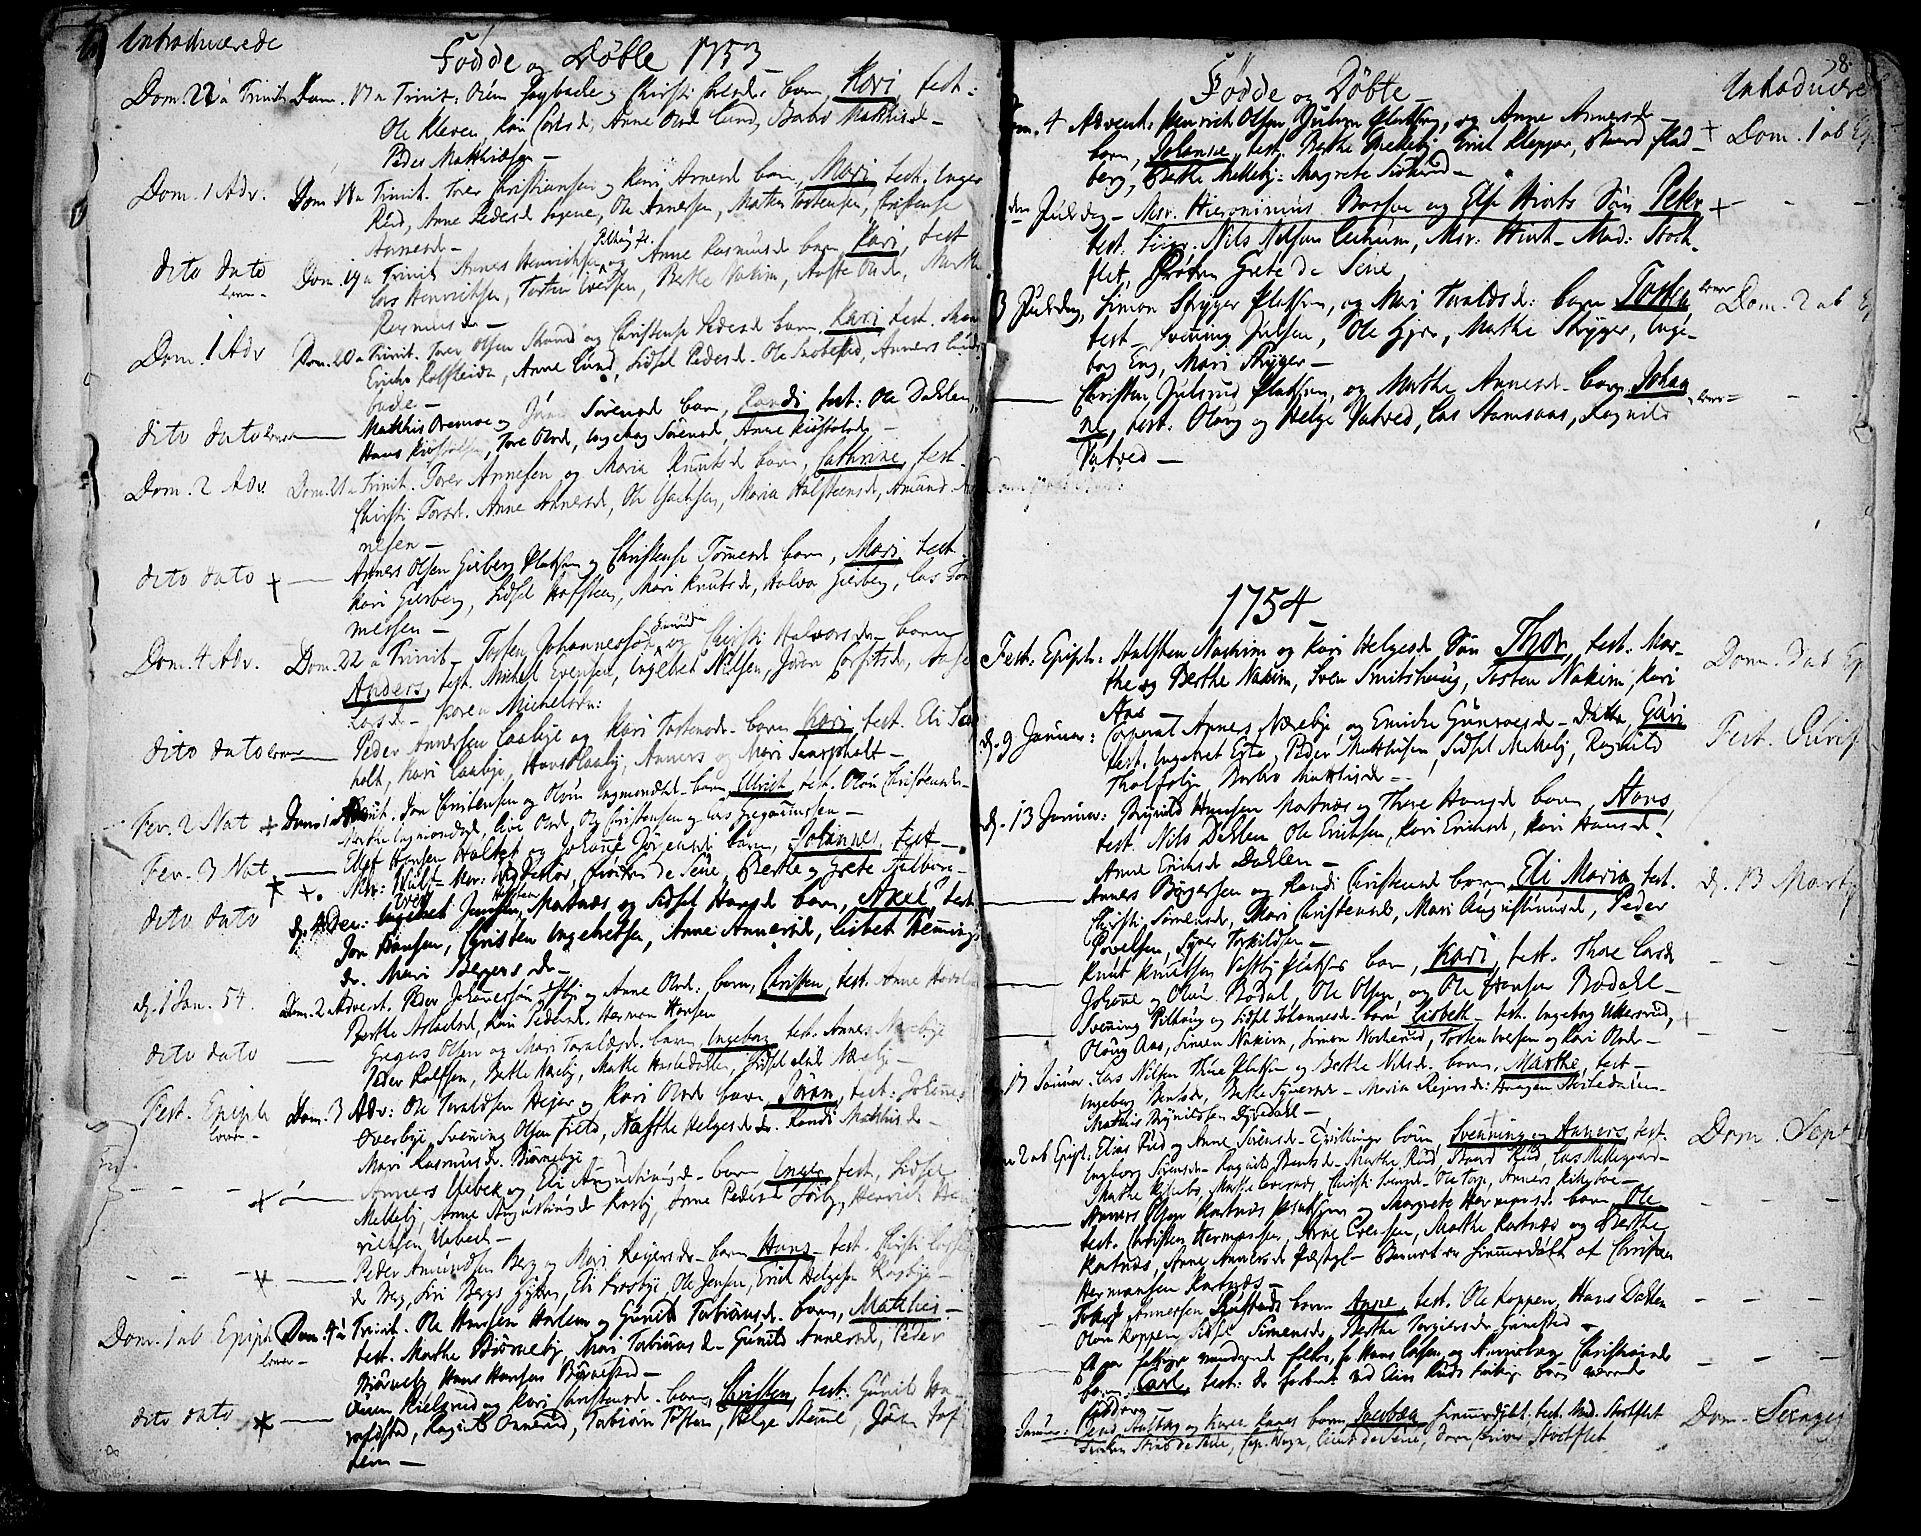 SAO, Rakkestad prestekontor Kirkebøker, F/Fa/L0003: Ministerialbok nr. I 3, 1752-1777, s. 8